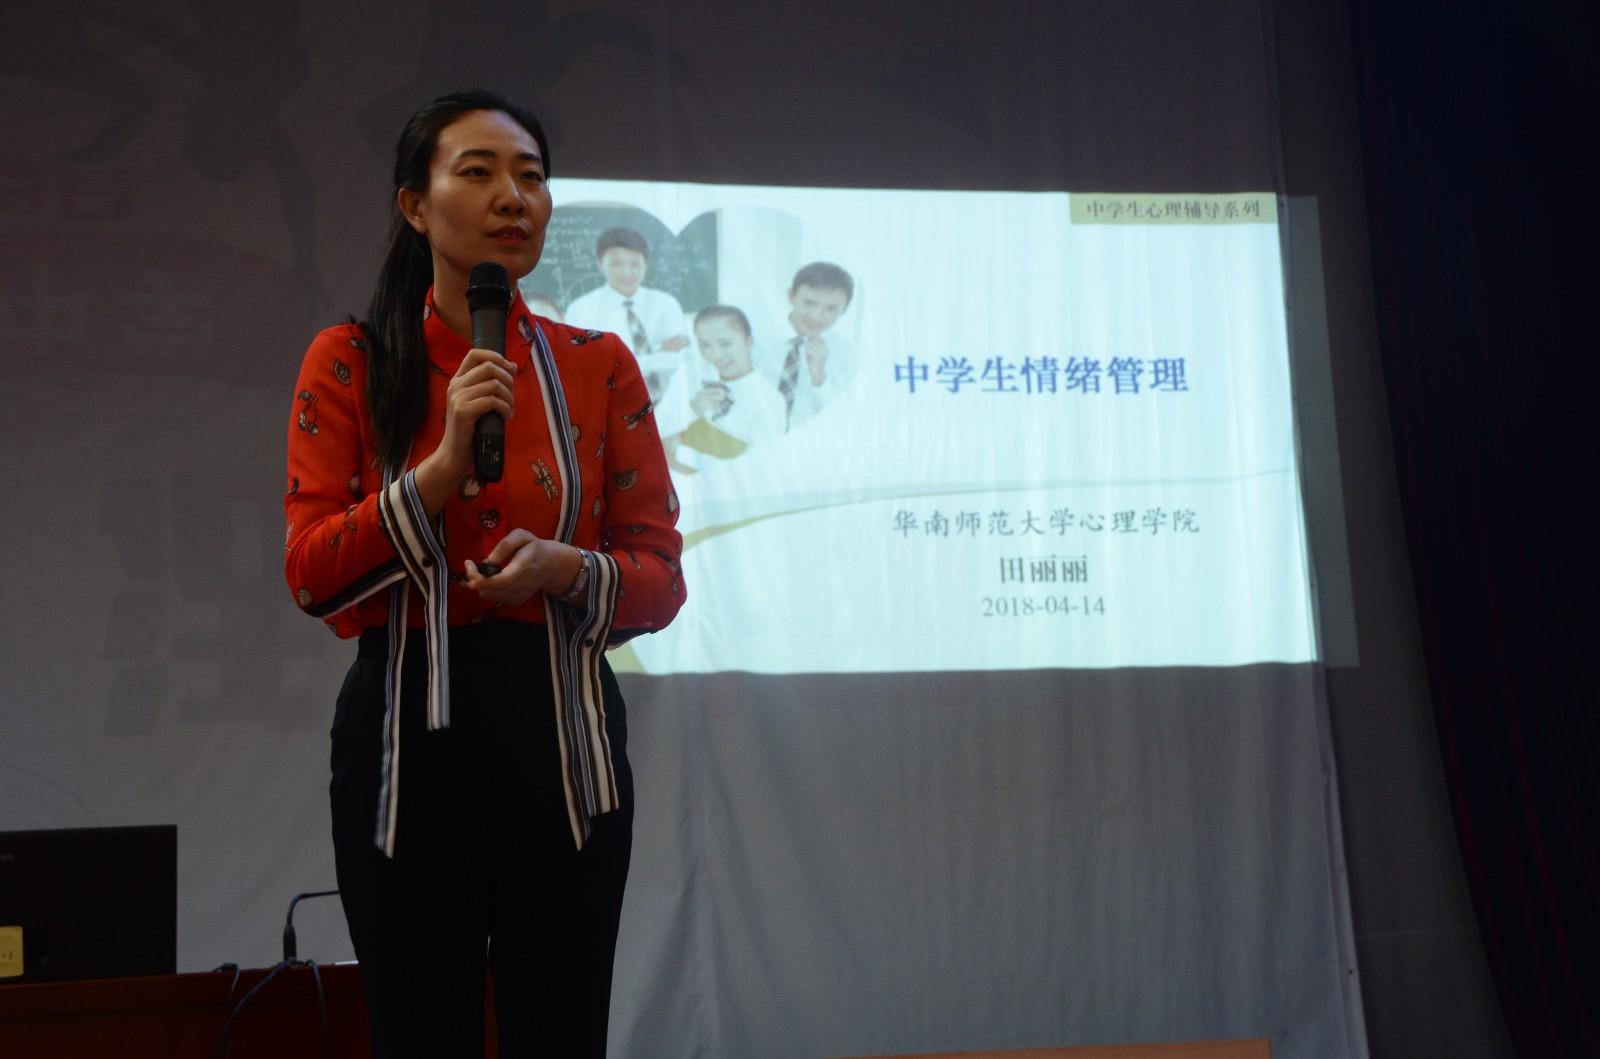 A4365bet体育娱乐场壹定发中学第一届心育节--田丽丽教授讲座.JPG